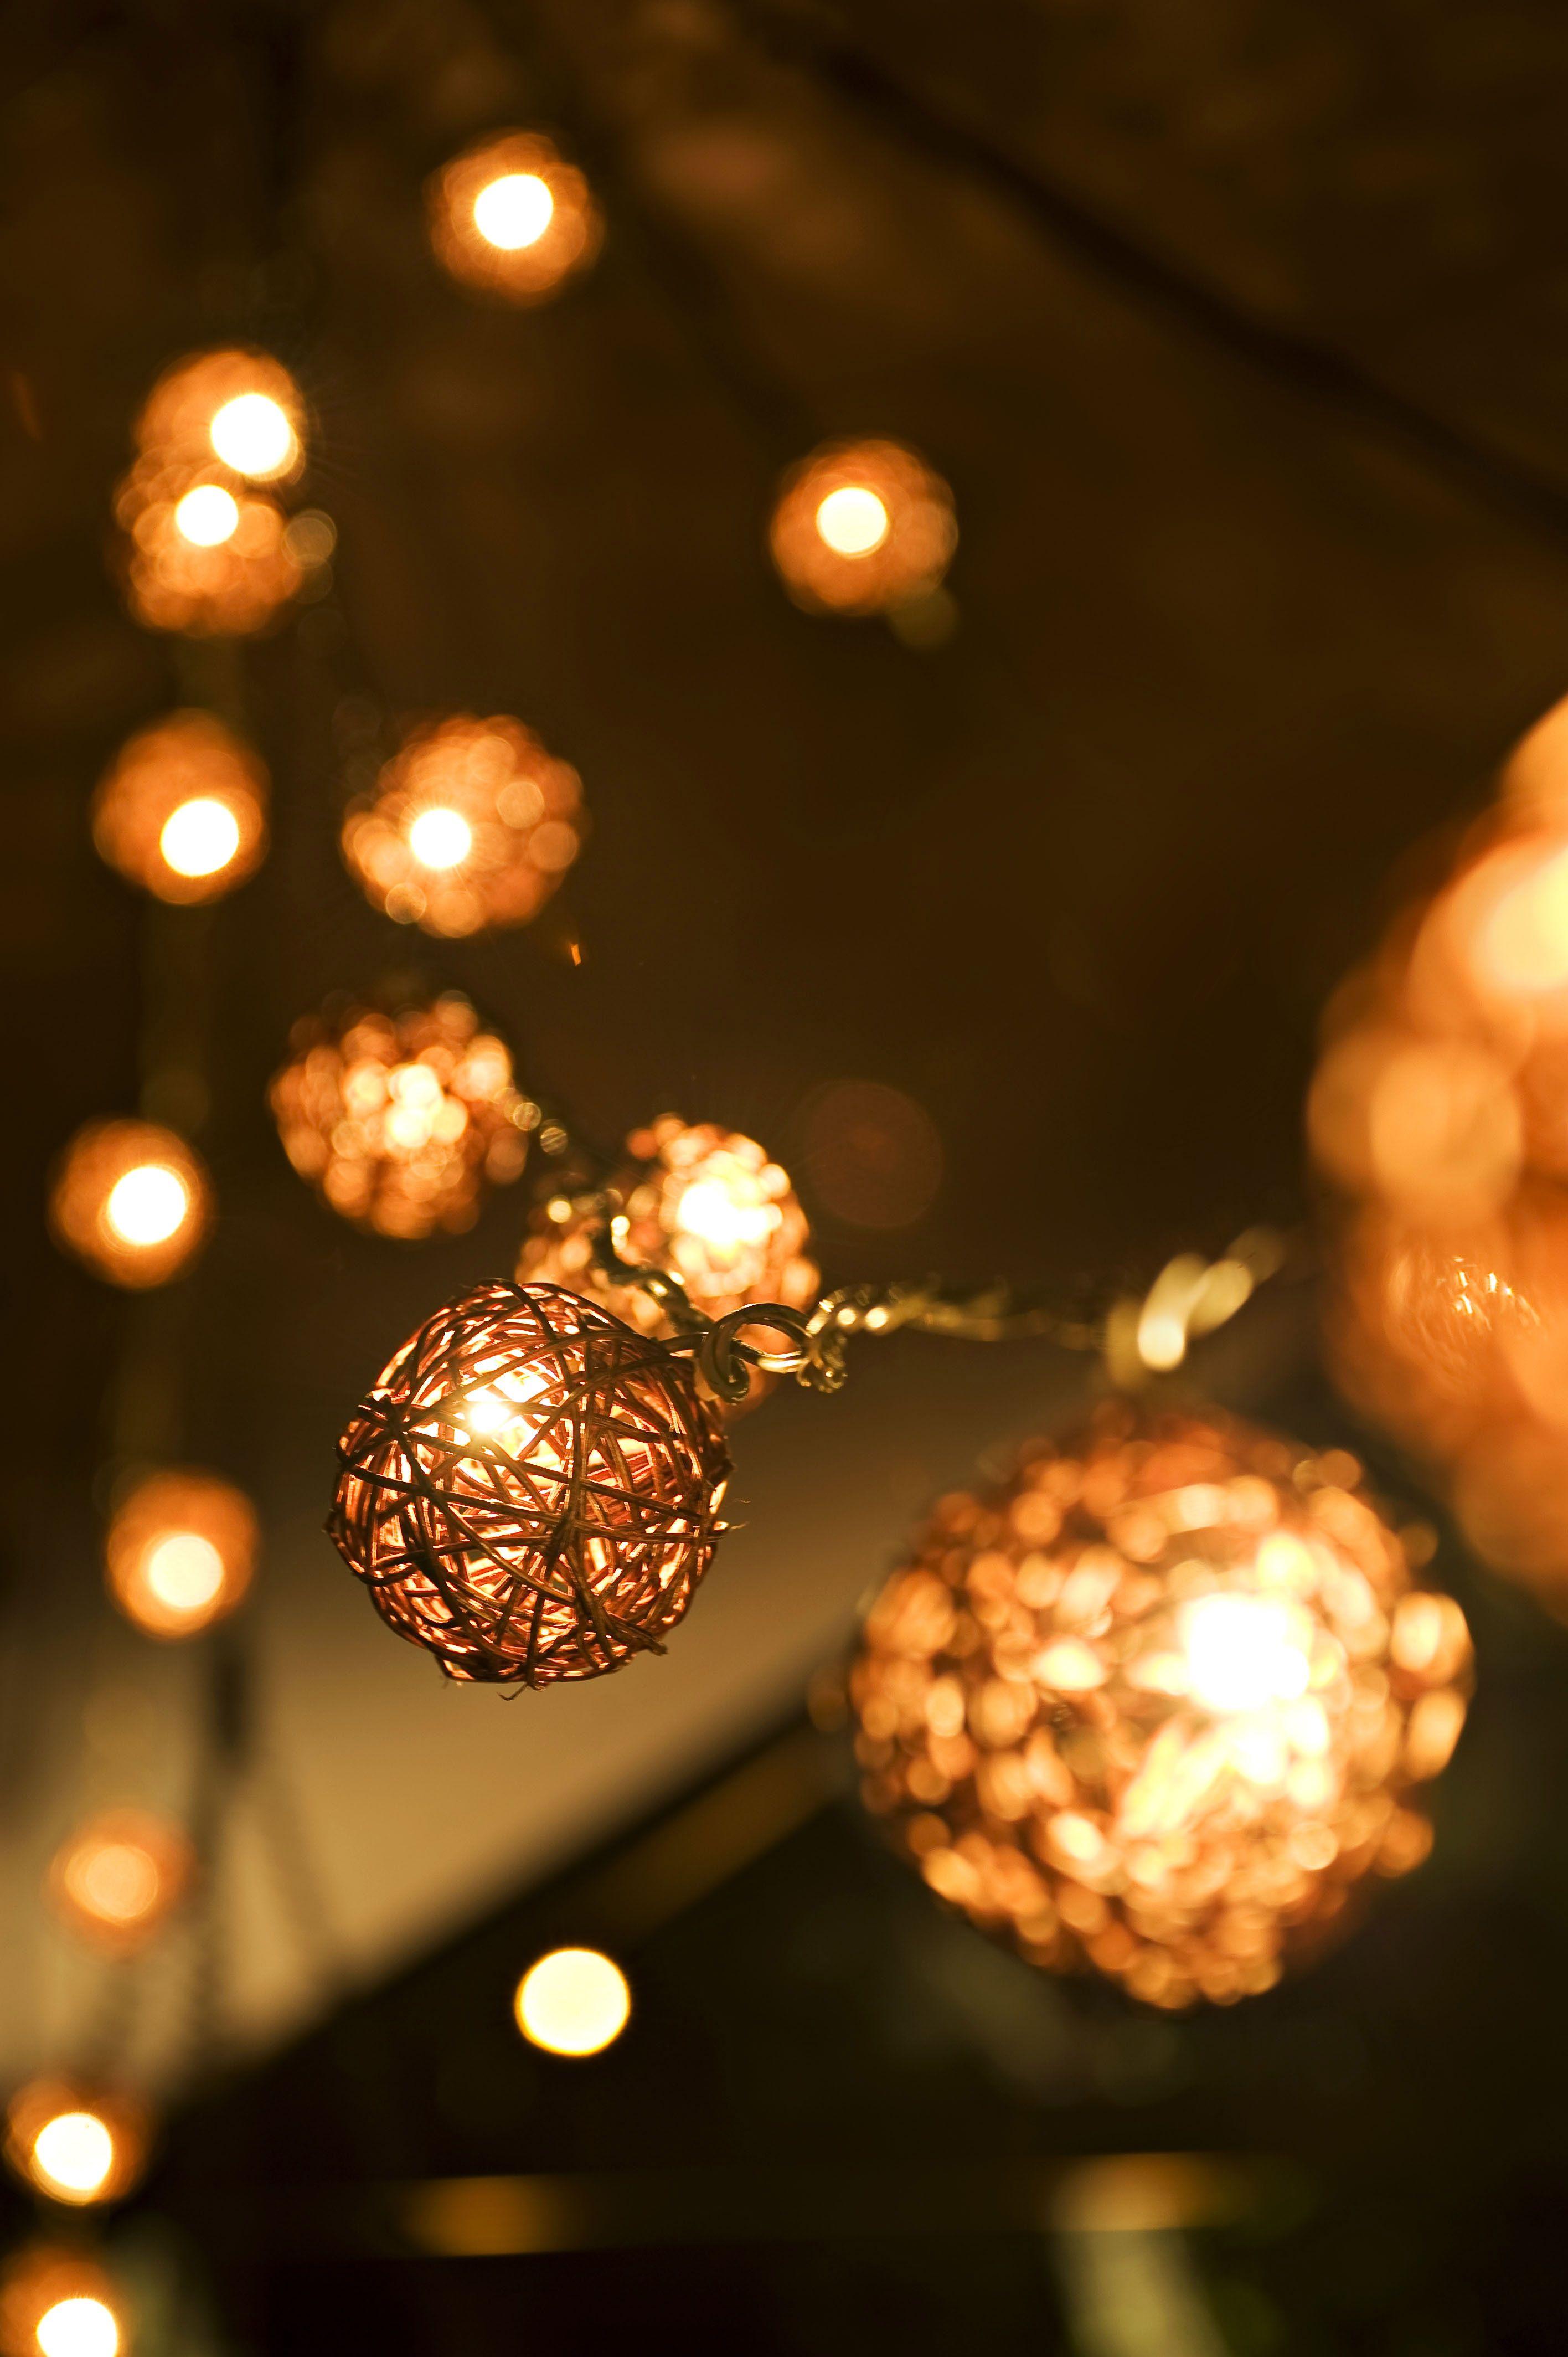 Pin By Lowe S On Savor Summer Patio Lights Decor Gazebo Lighting Diy Outdoor Lighting